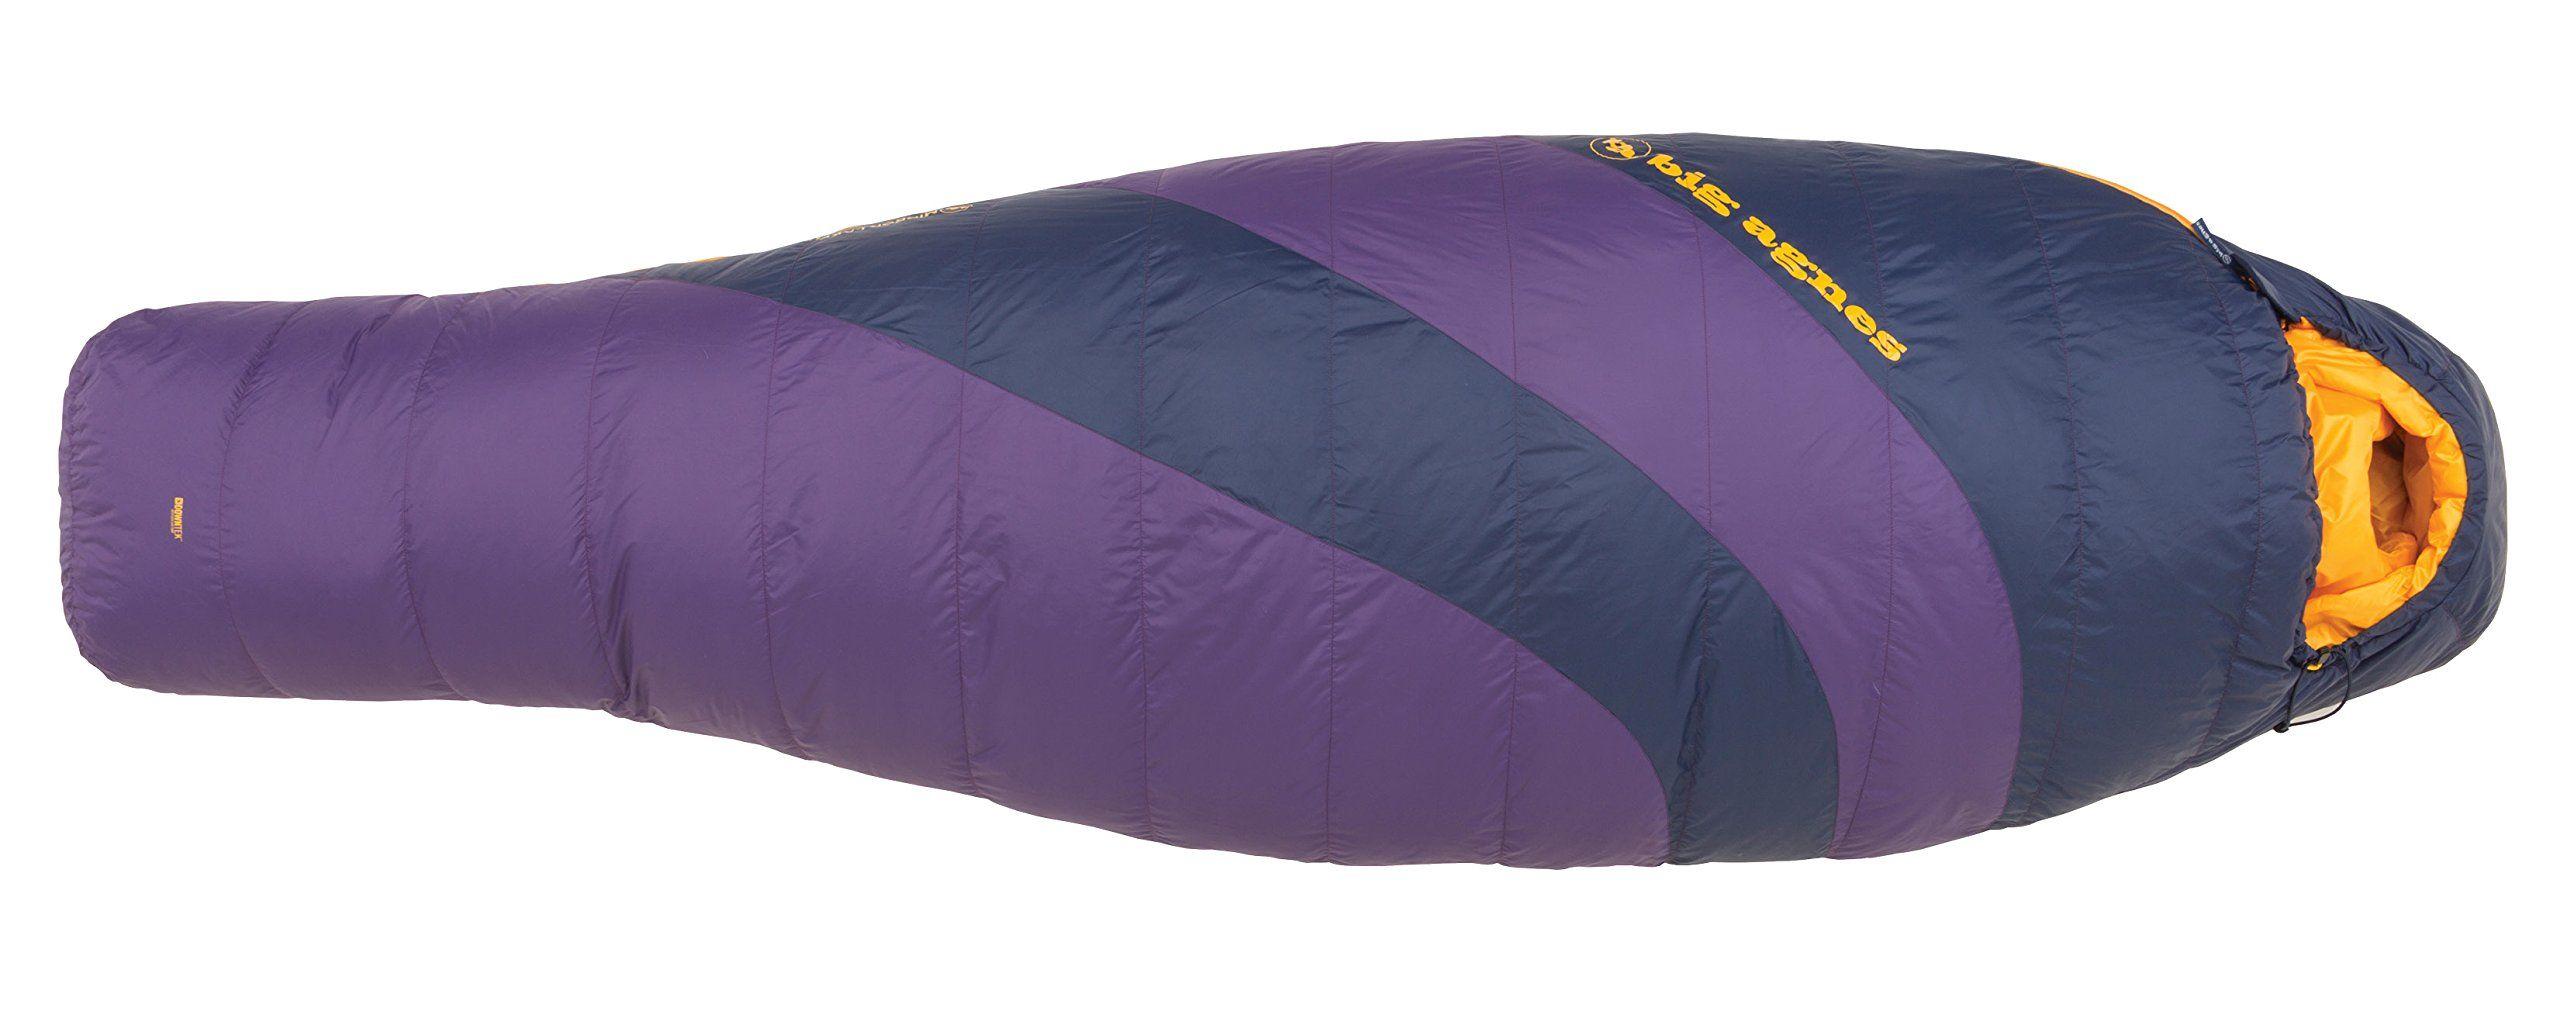 Big Agnes Mirror Lake 20 Sleeping Bag Regular Length